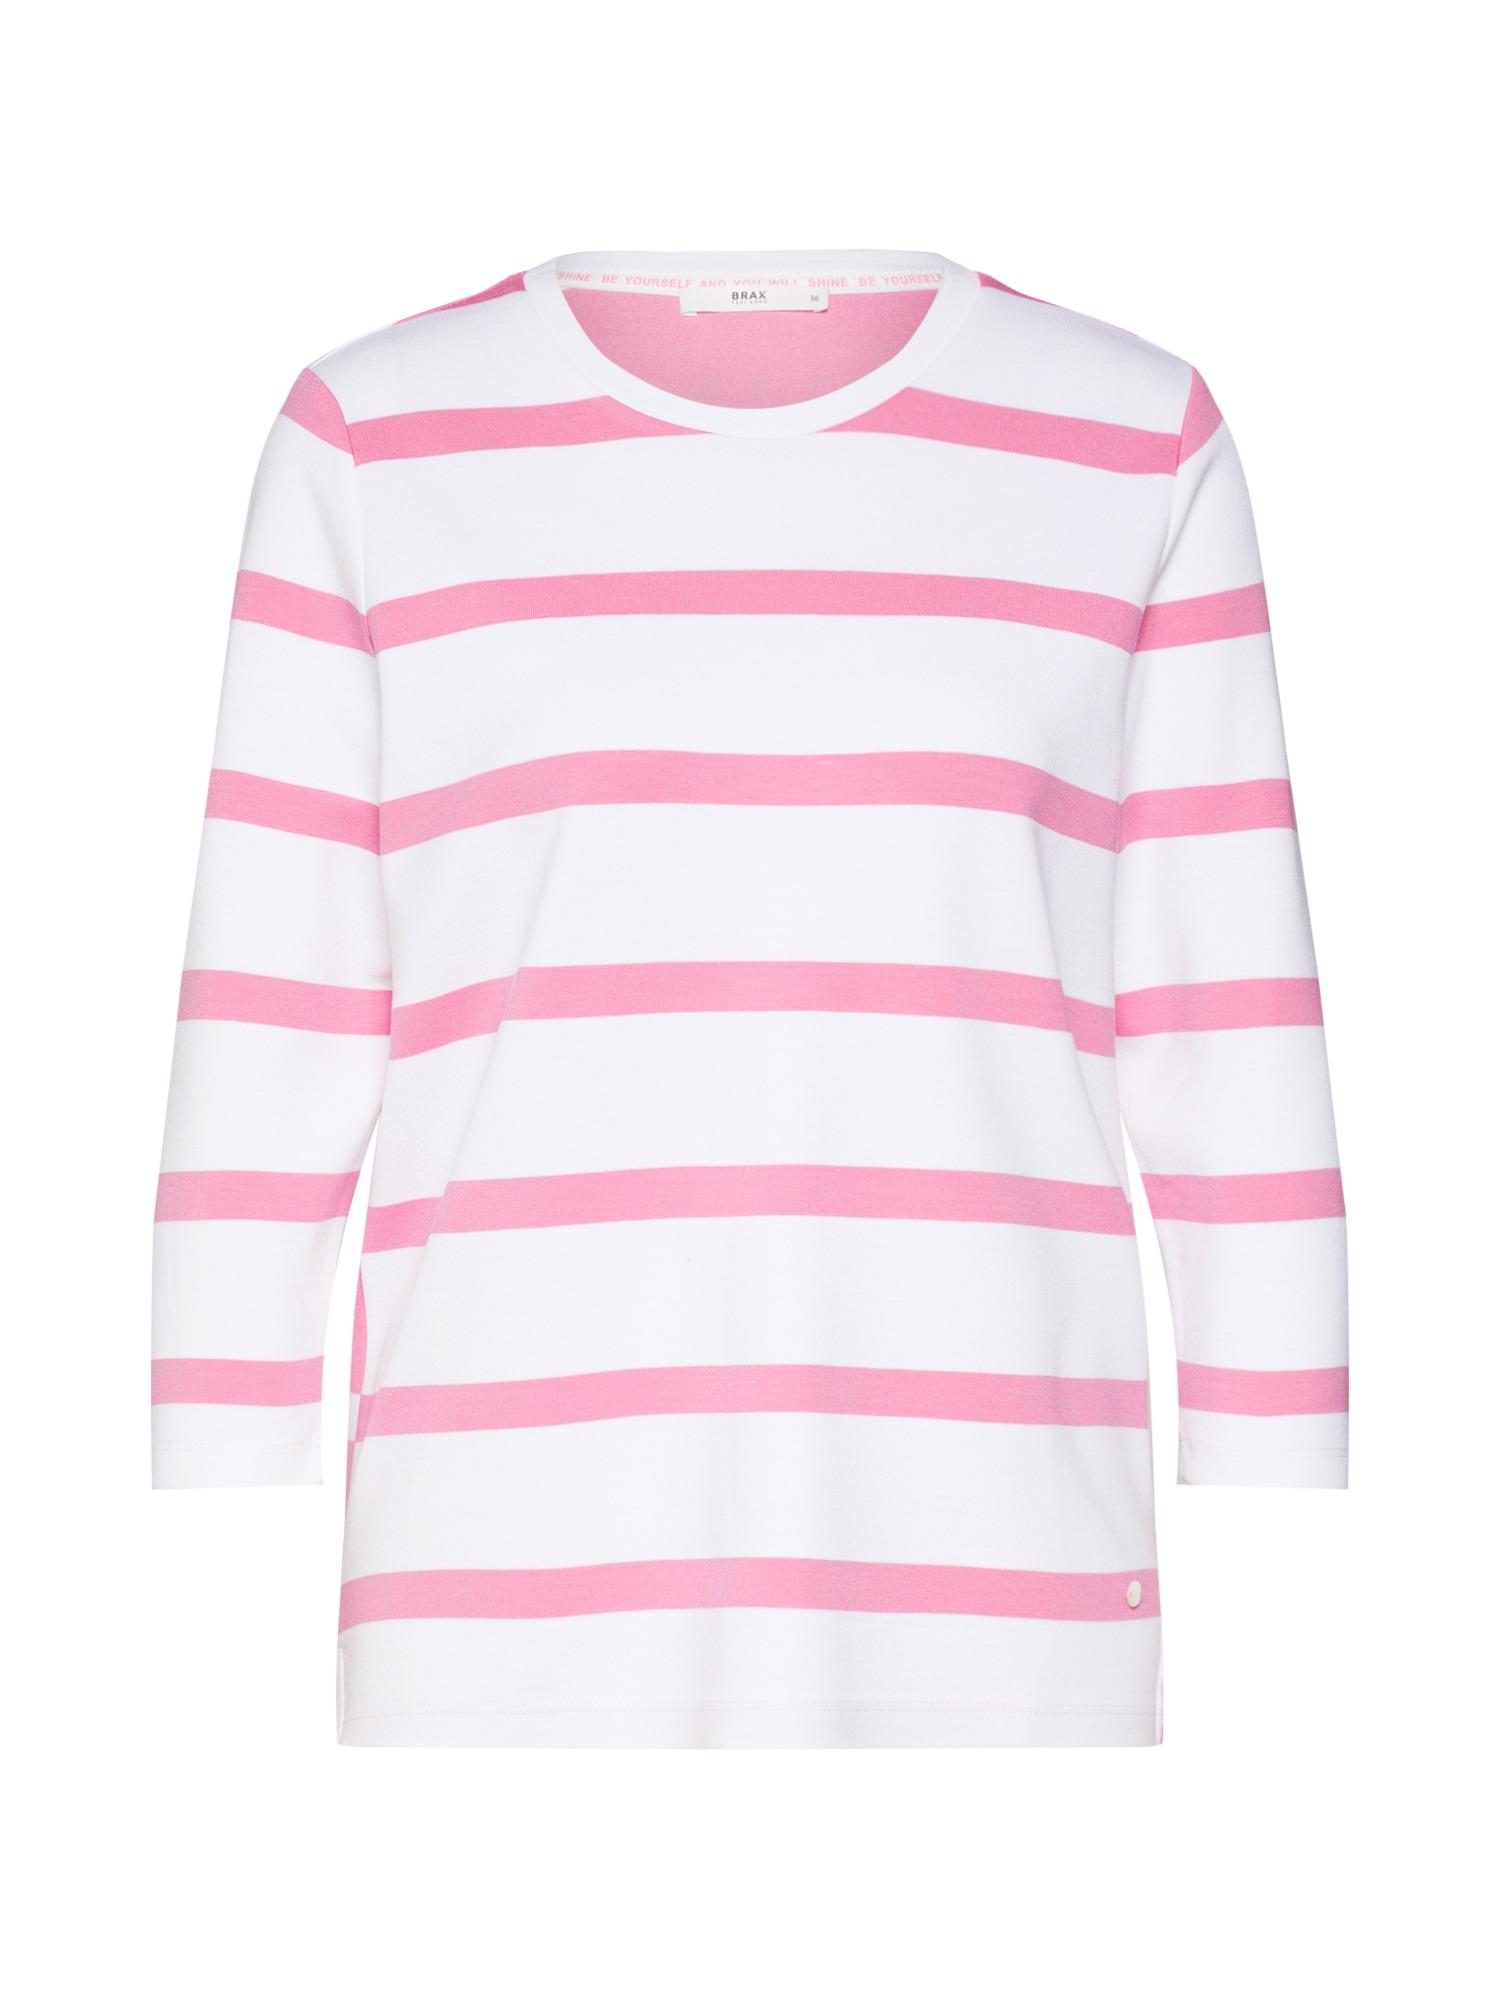 Tričko Bobbie pink bílá BRAX